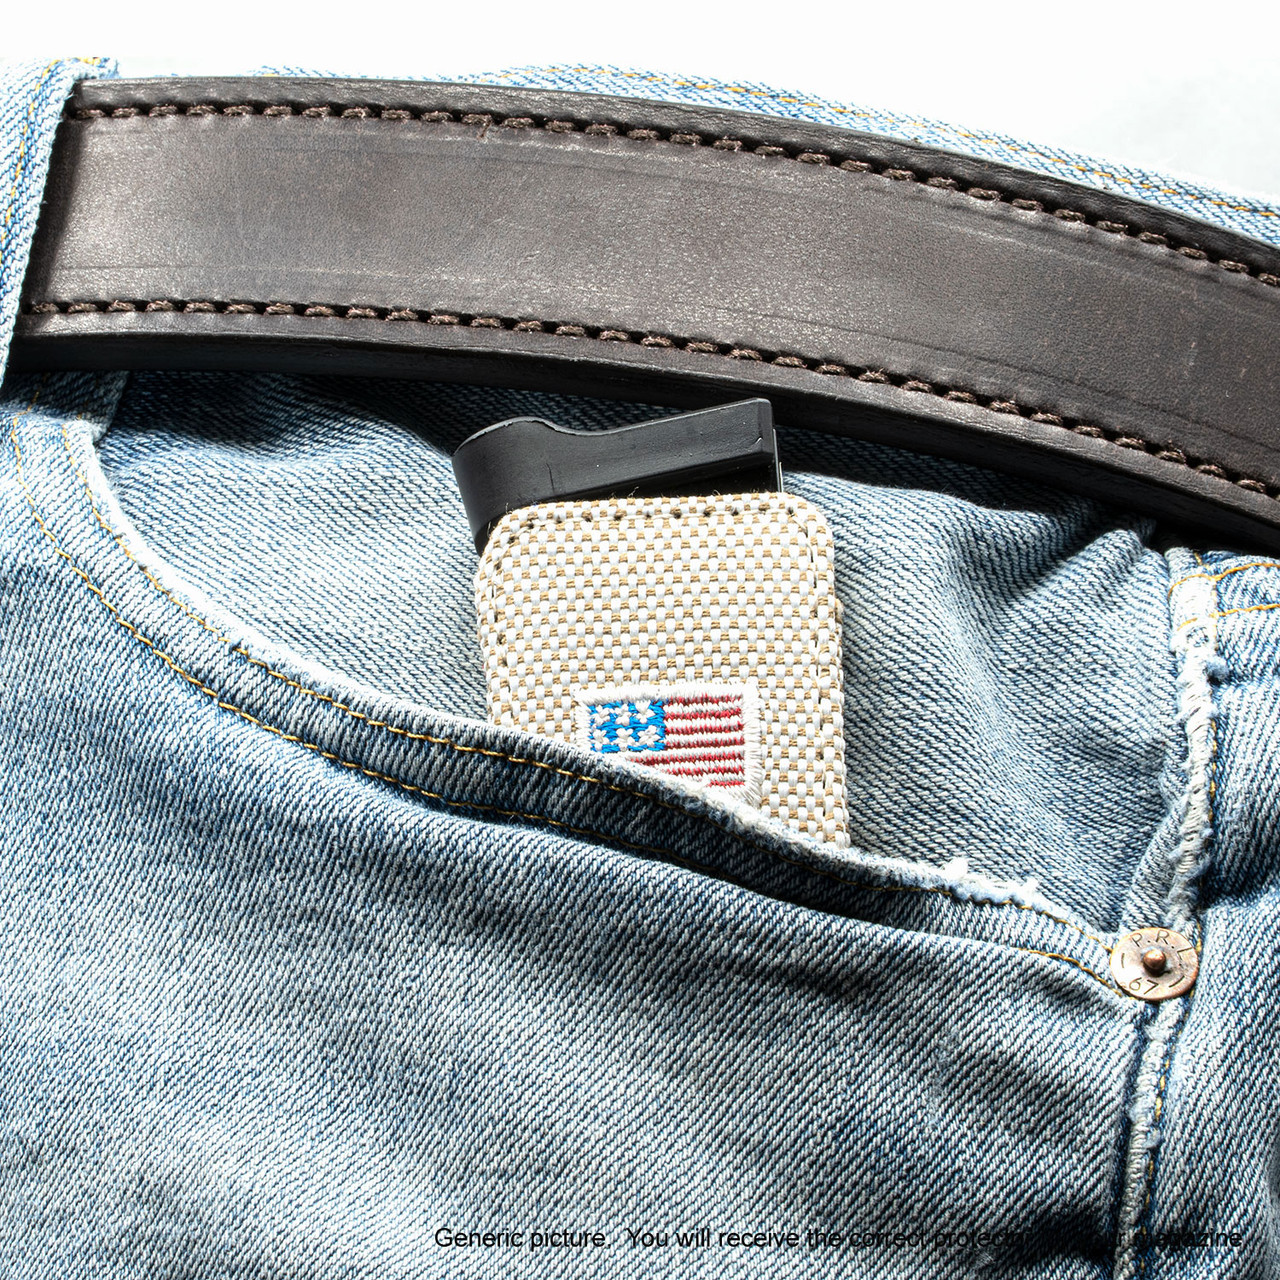 Springfield XDS 40 Tan Canvas Flag Magazine Pocket Protector